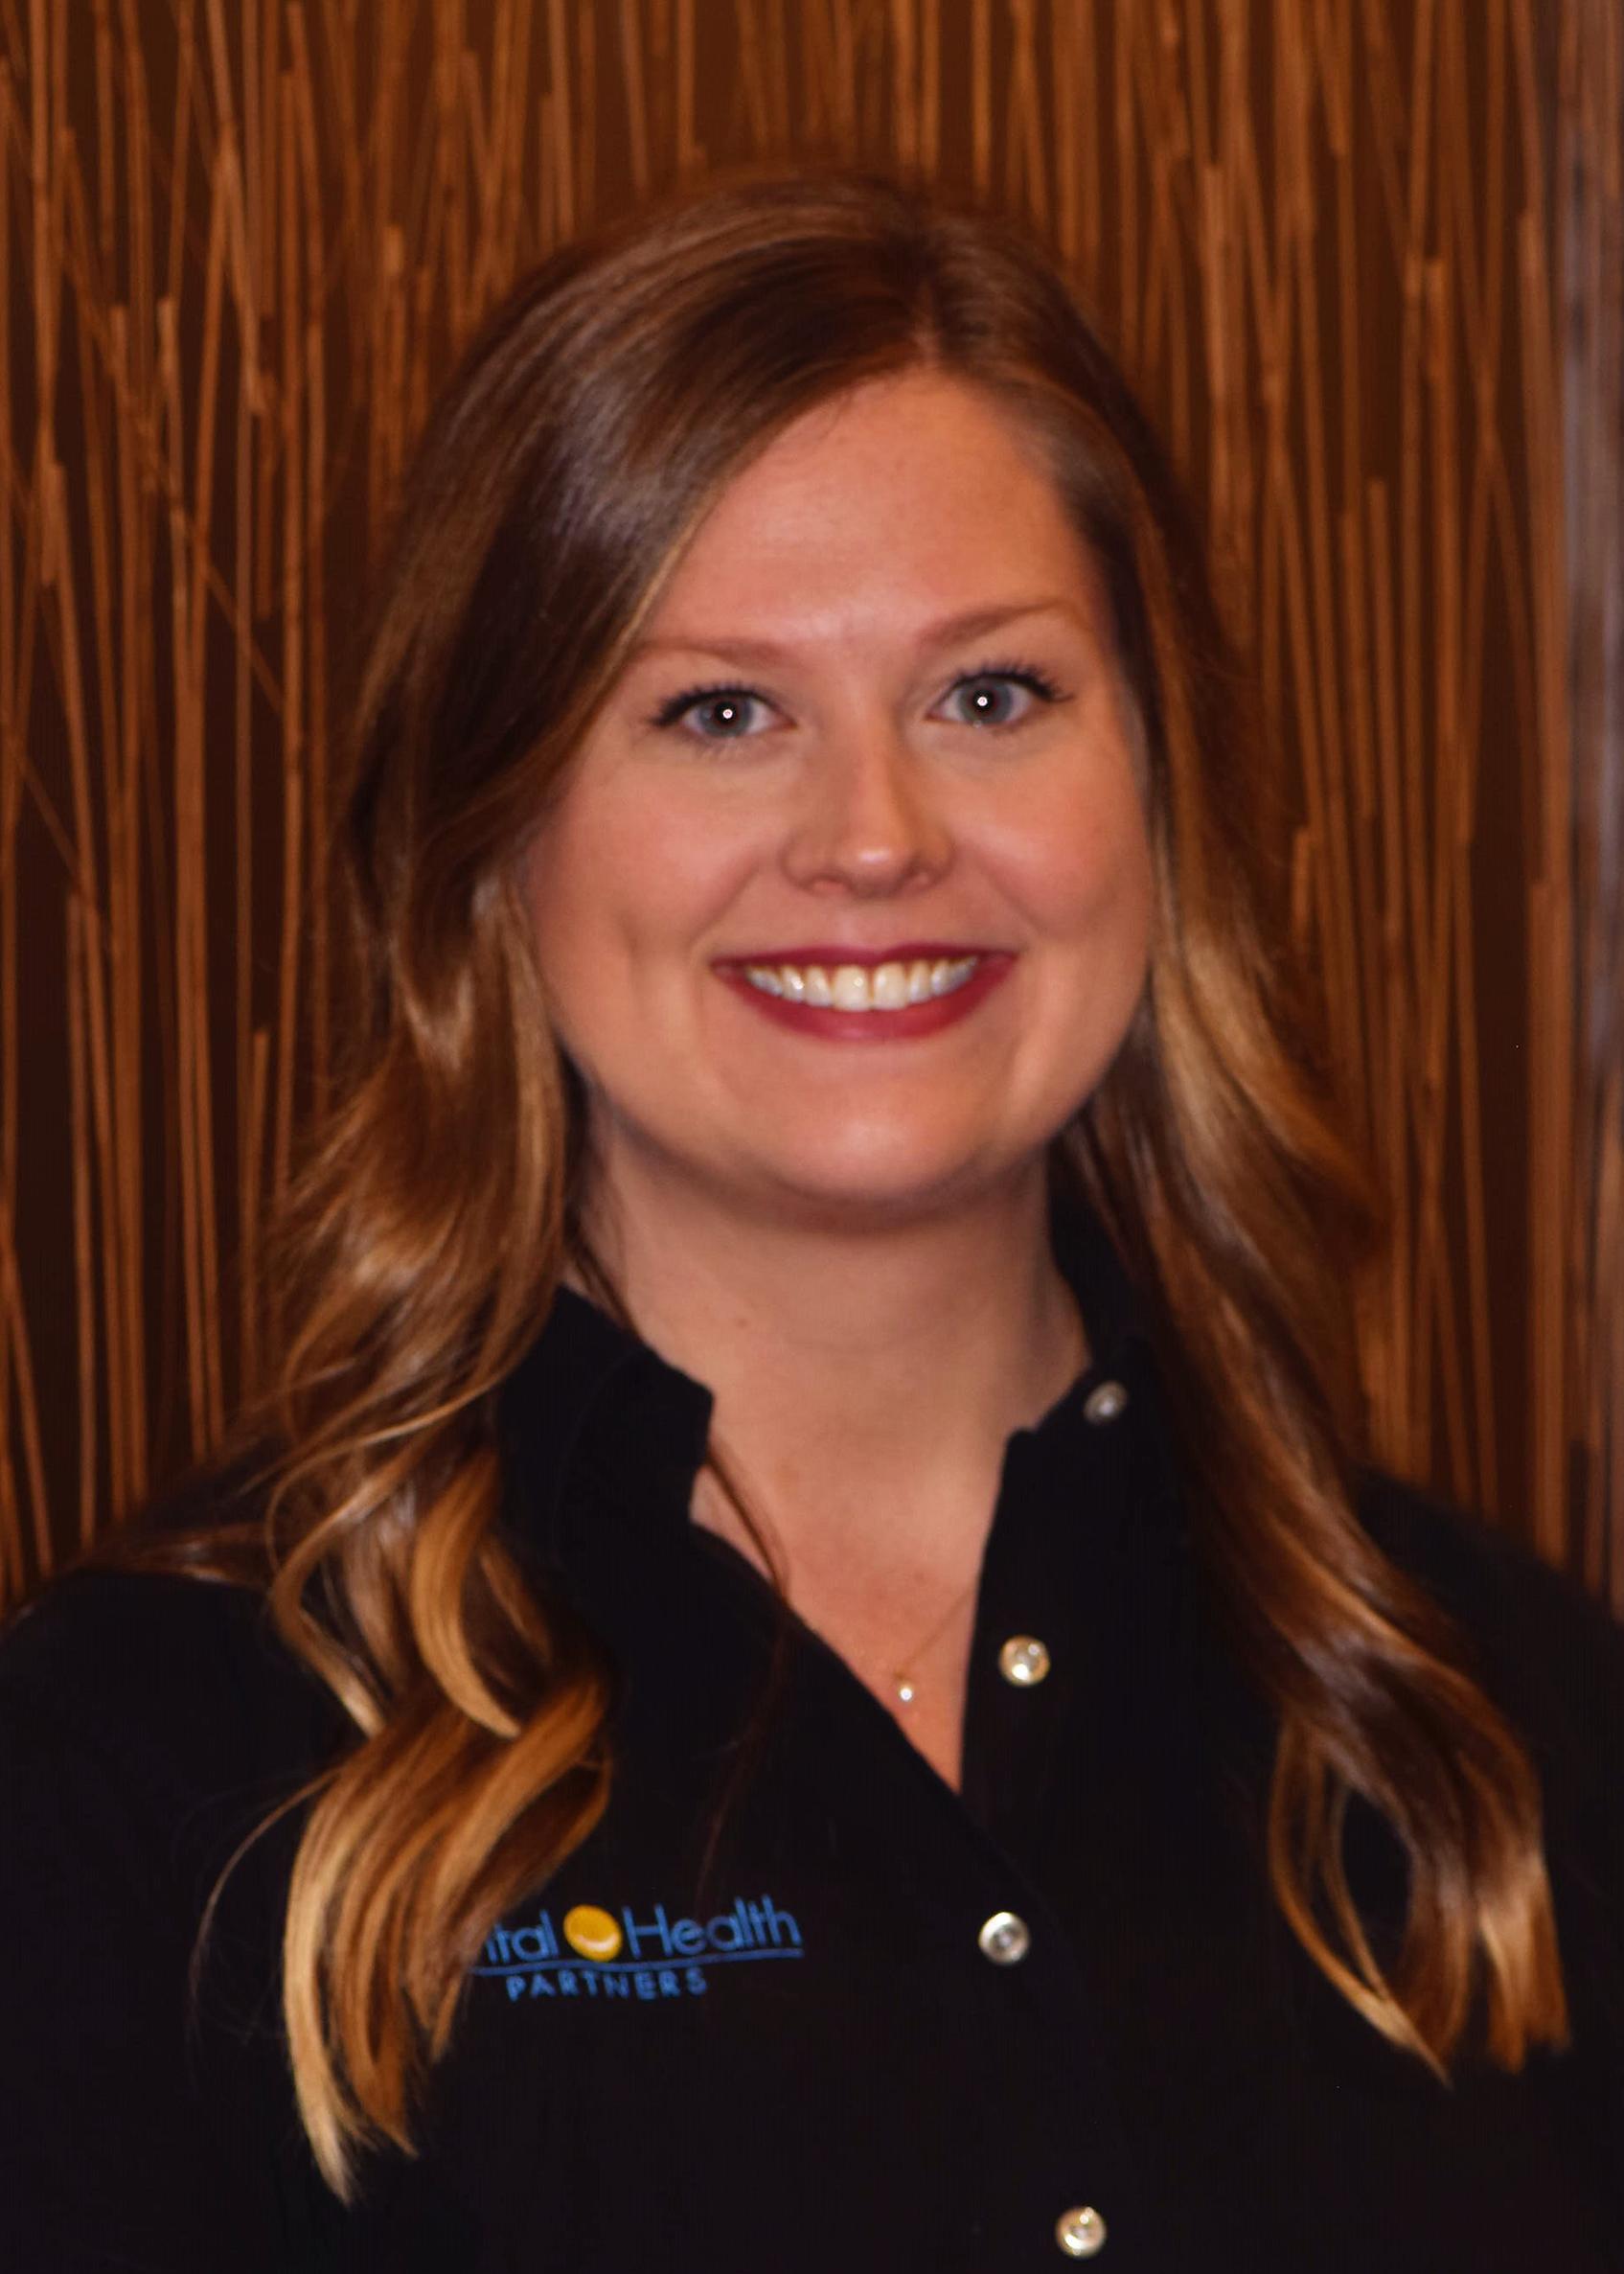 Dr. Karley Brantman - Dentist - Dental Health Partners, Cedar Rapids, IA